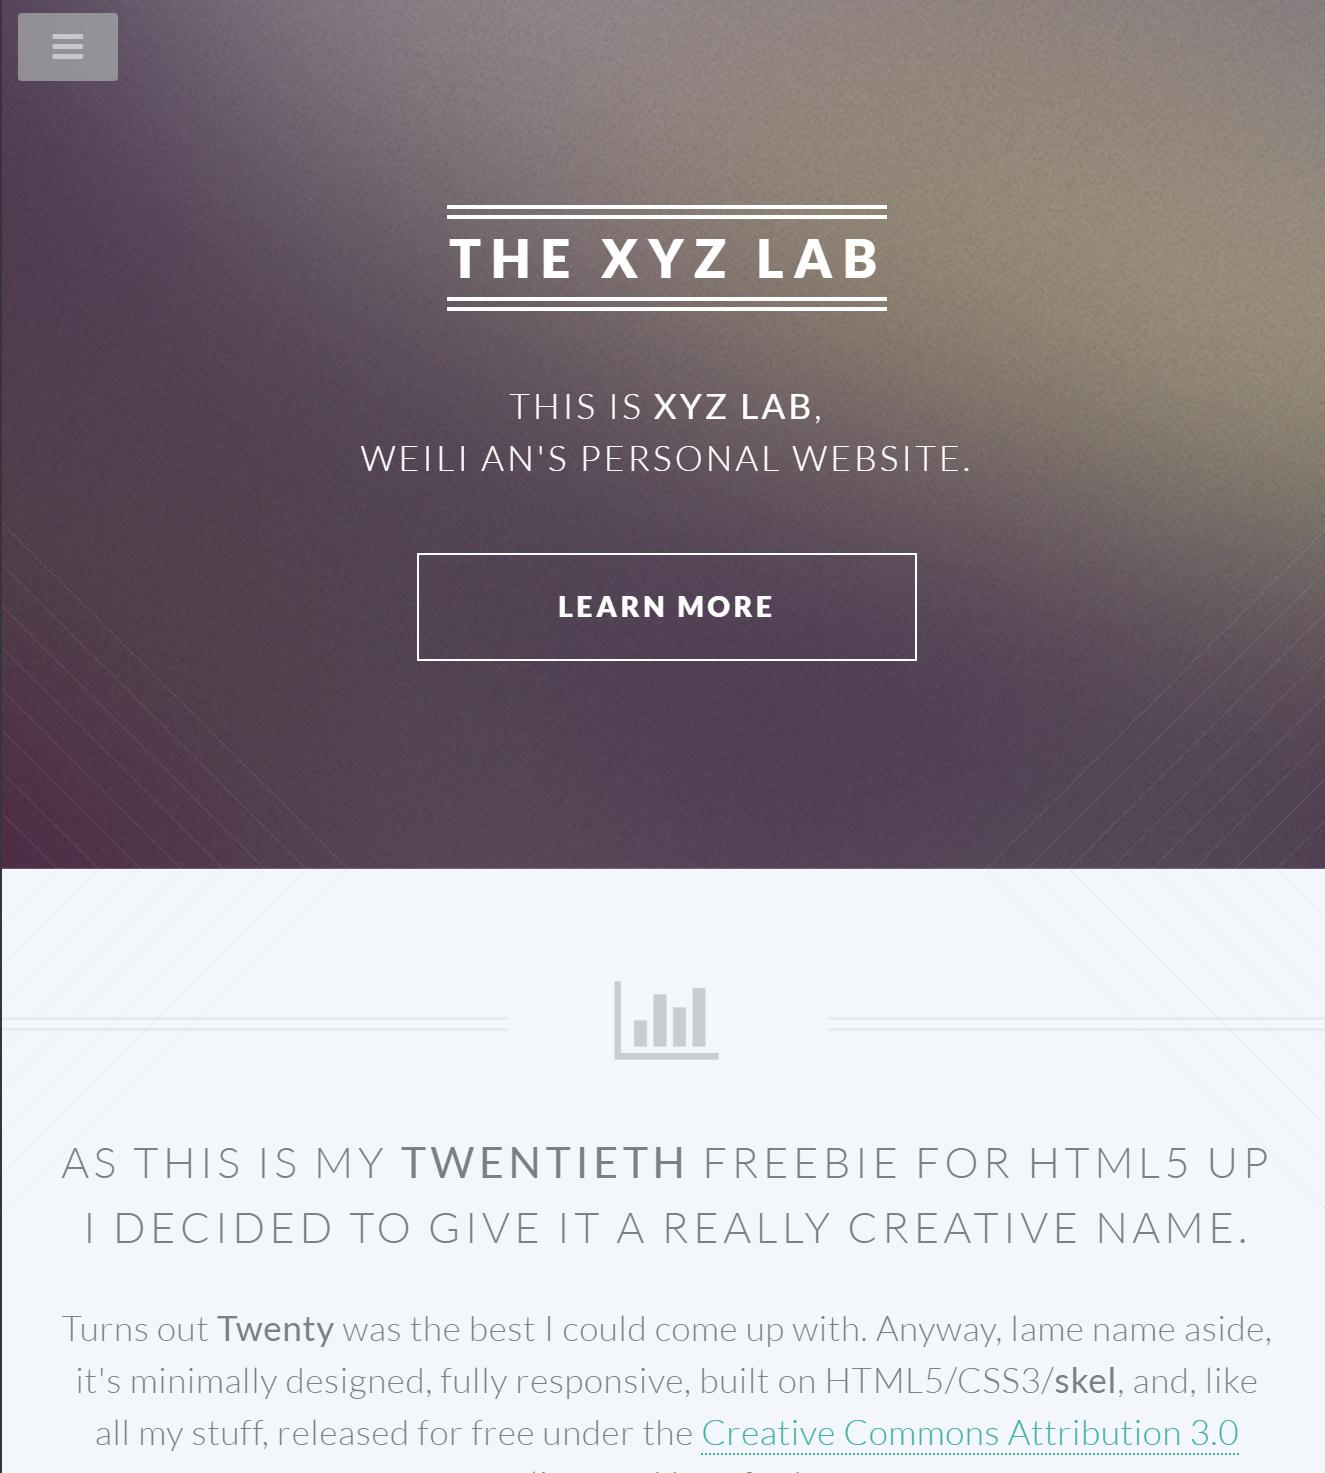 thexyzlab-old